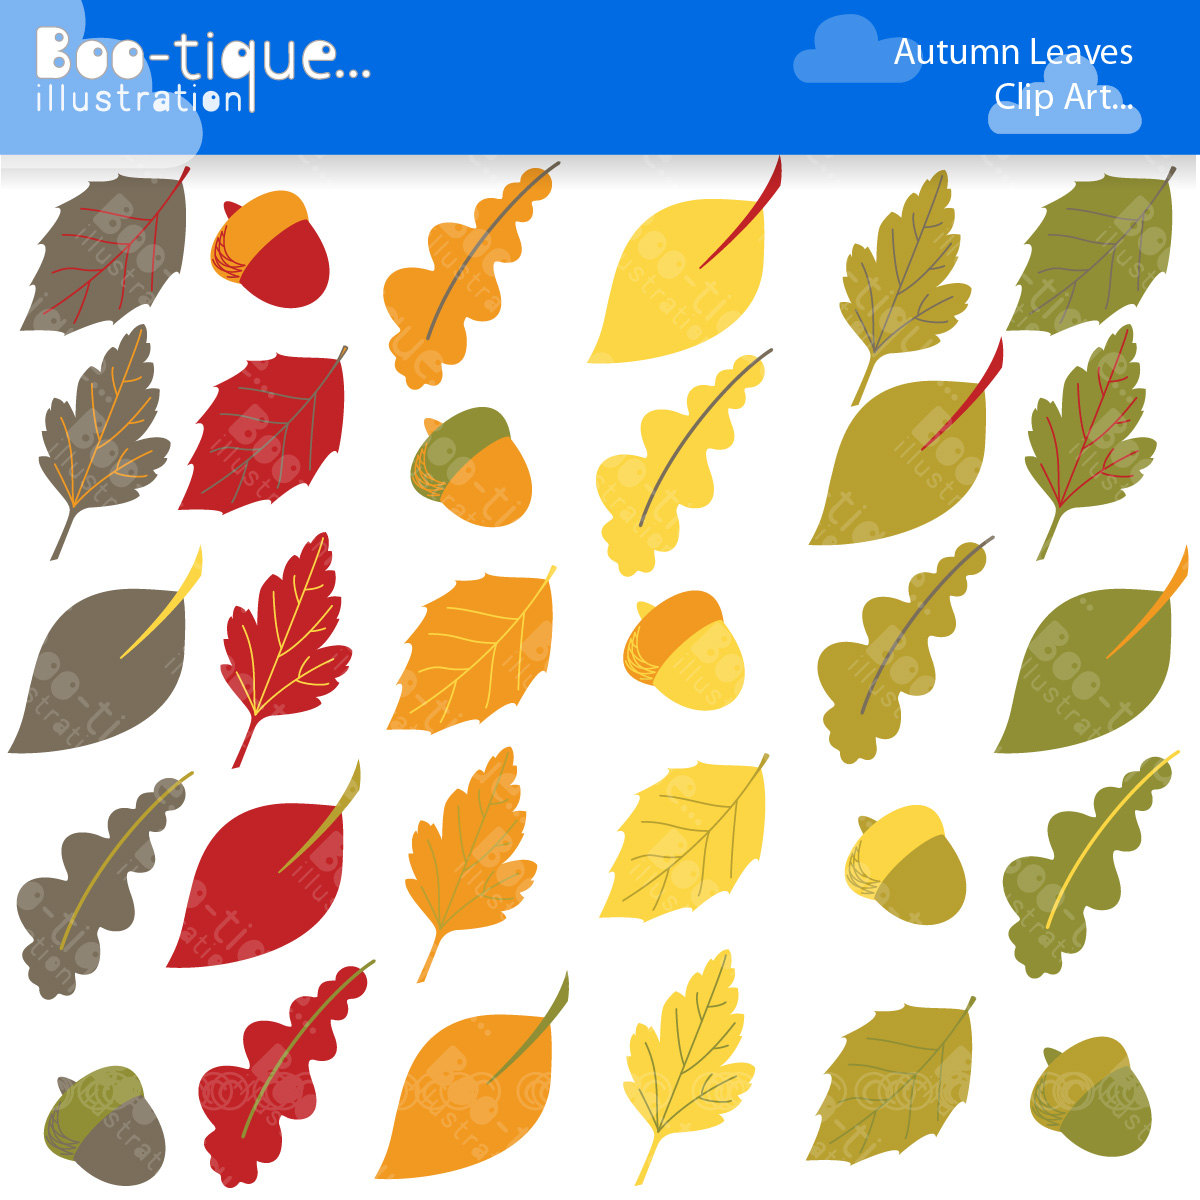 Leaves boo tique illustration. Acorn clipart leaf